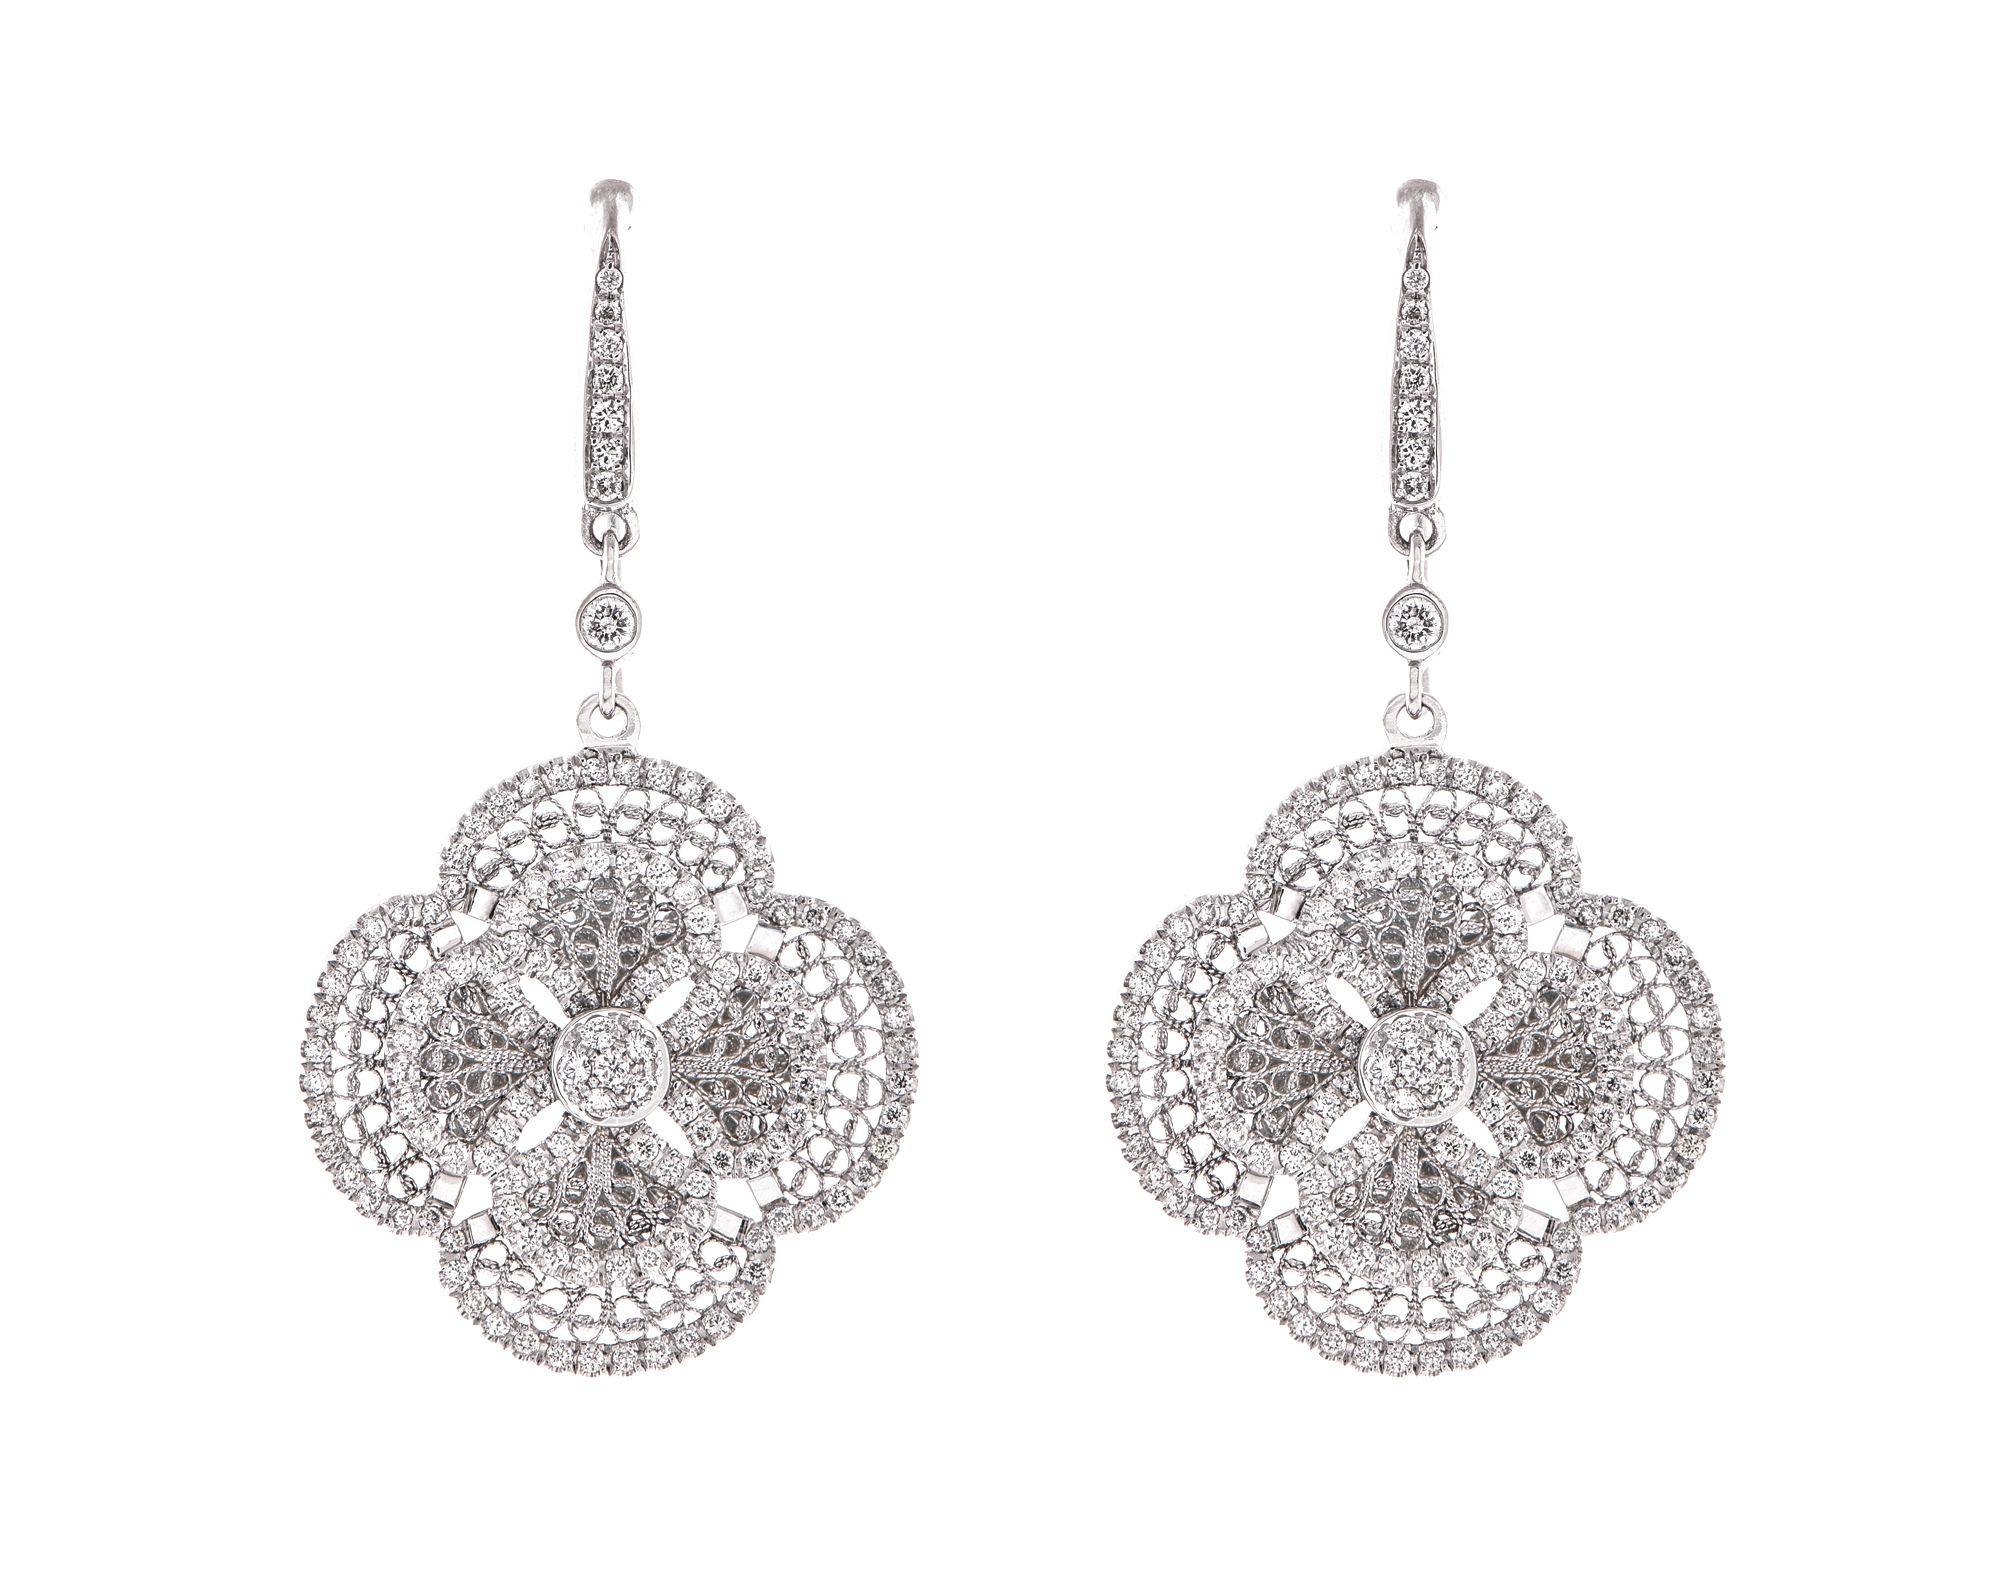 BRINCOS BLOSSOM by Eleuterio jewellery